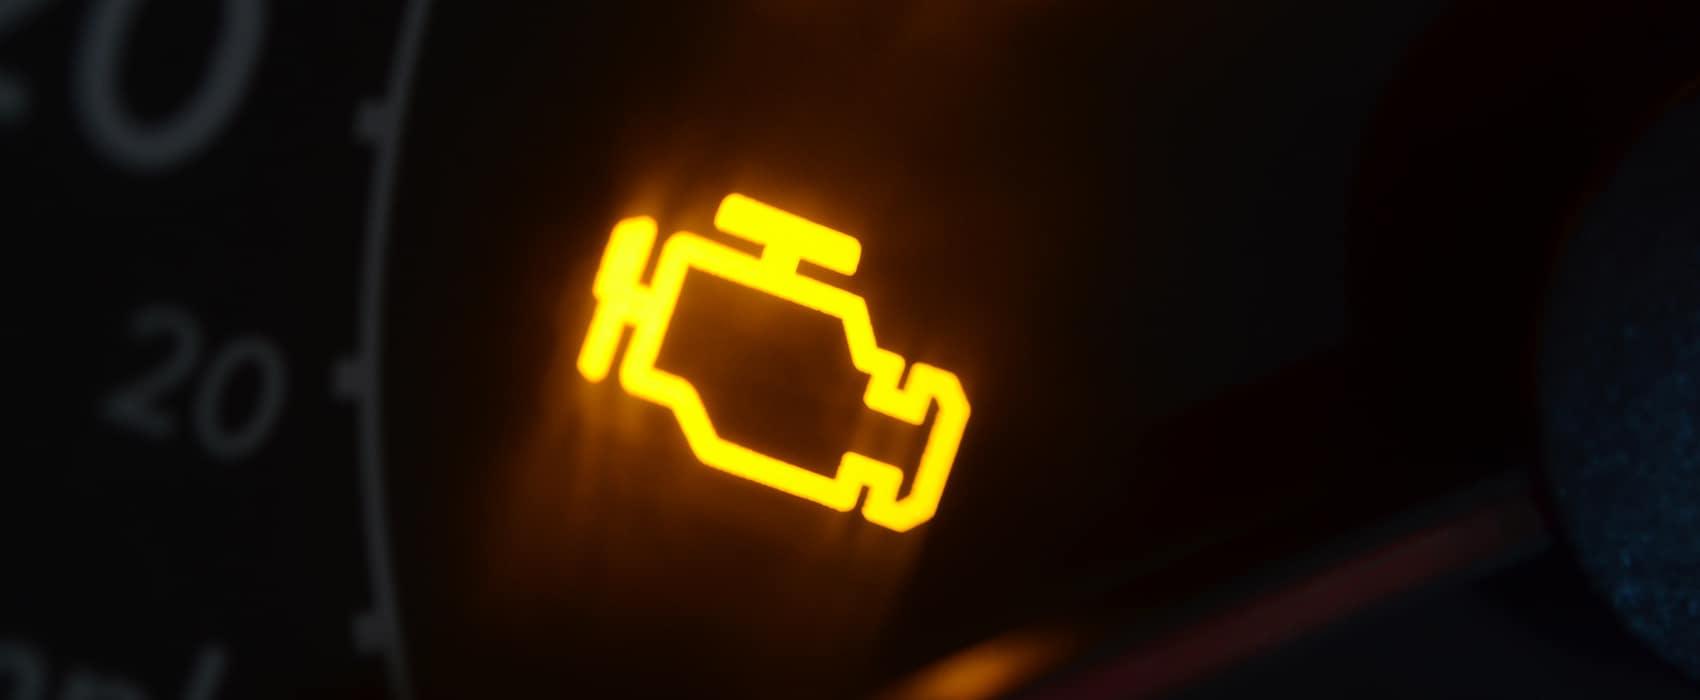 How To Reset Check Engine Light On Dodge Grand Caravan Vatland Cdjr